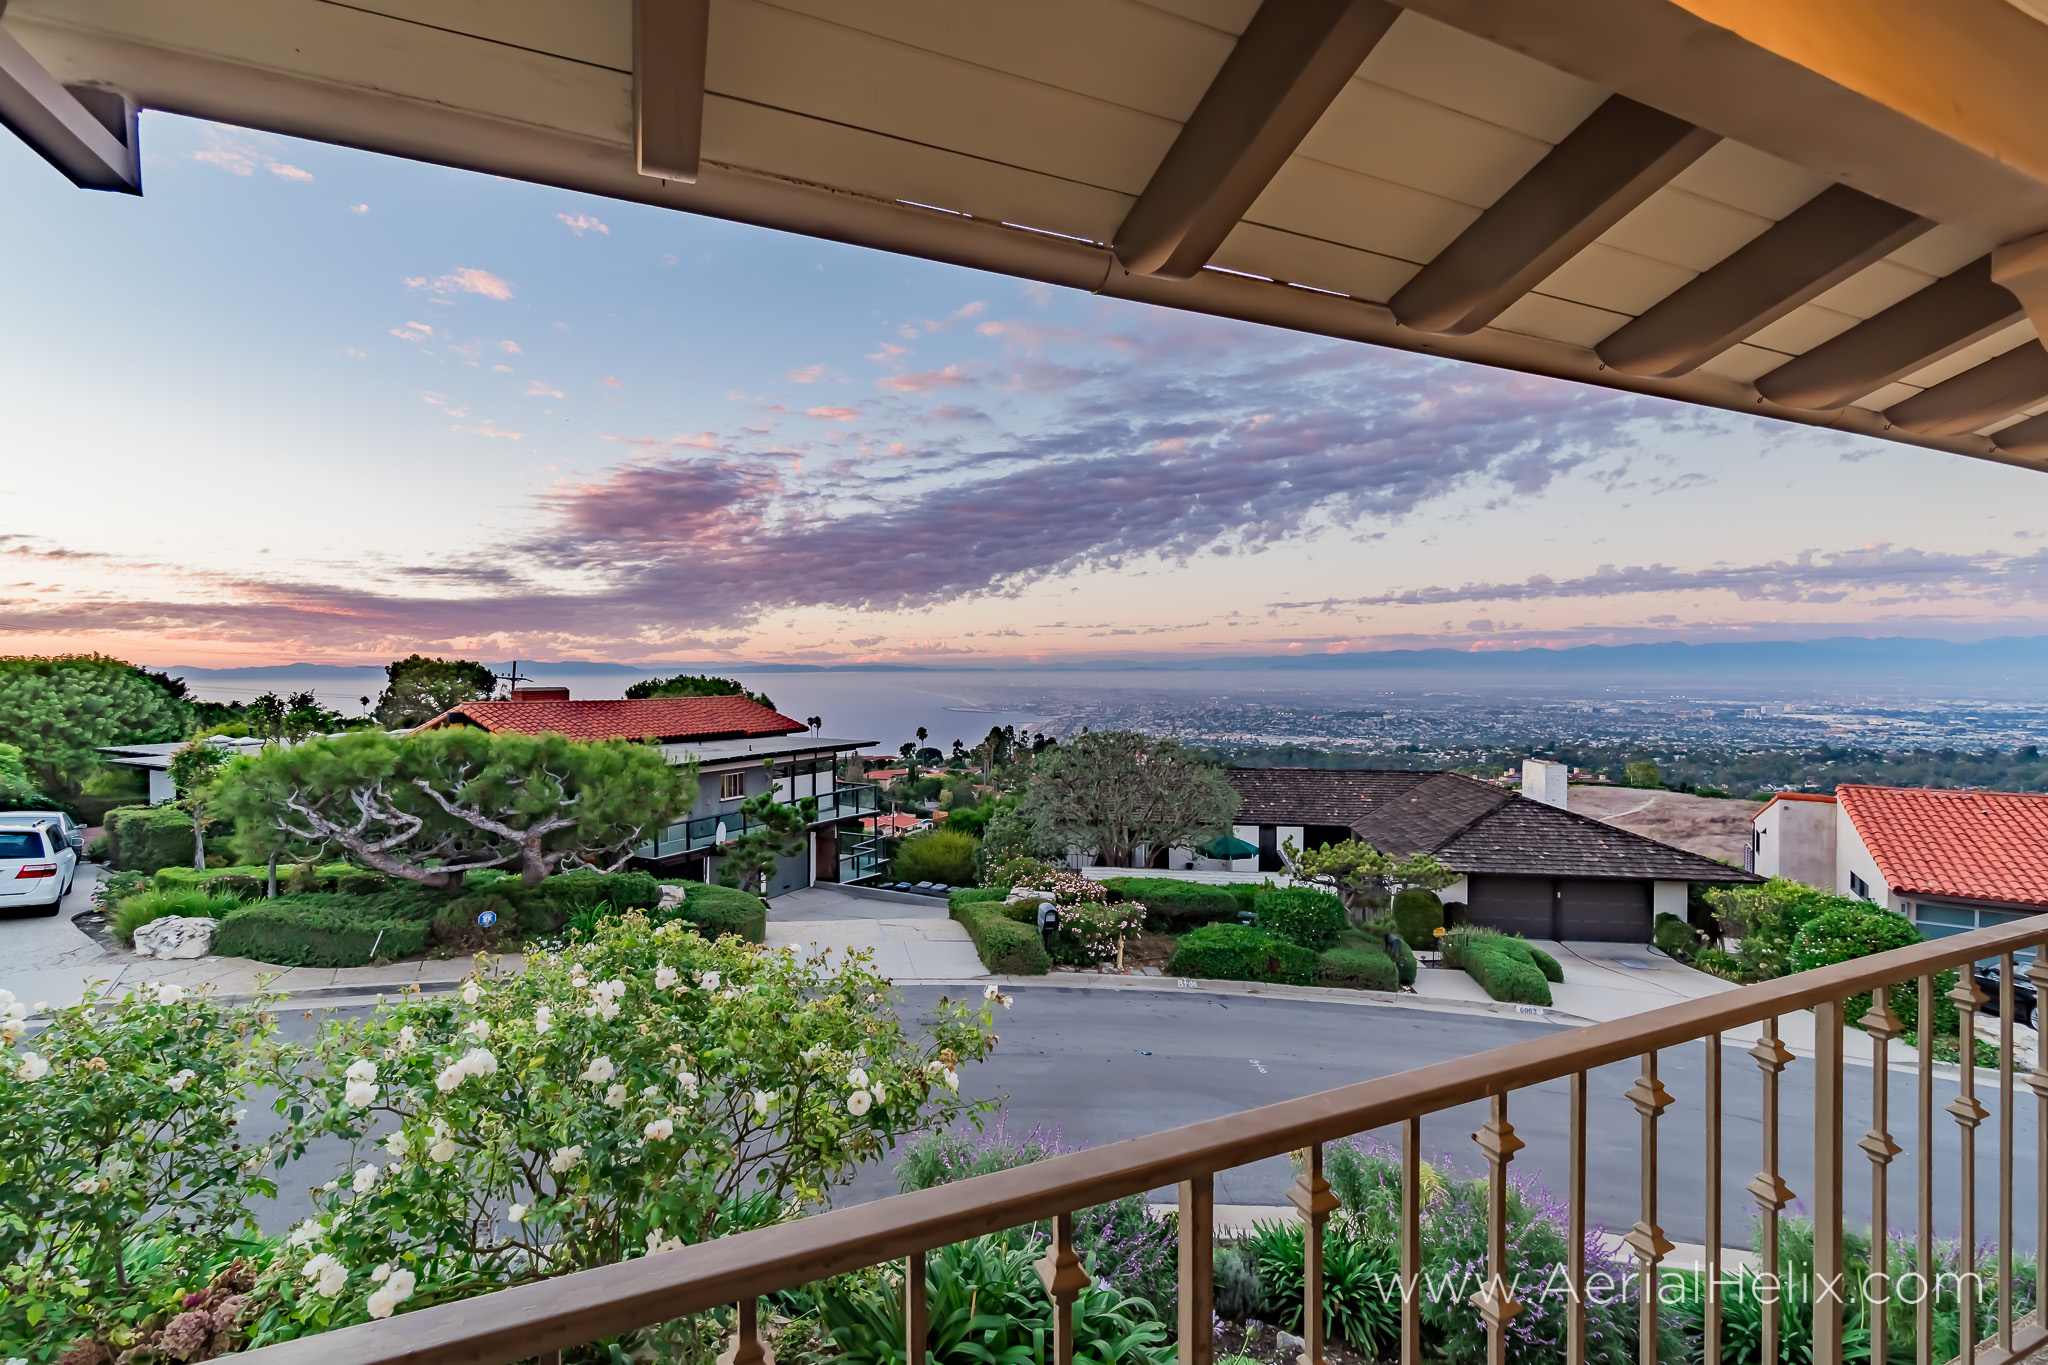 Woodfern Drive Ground- HELIX Real Estate Aerial Photographer-38.jpg